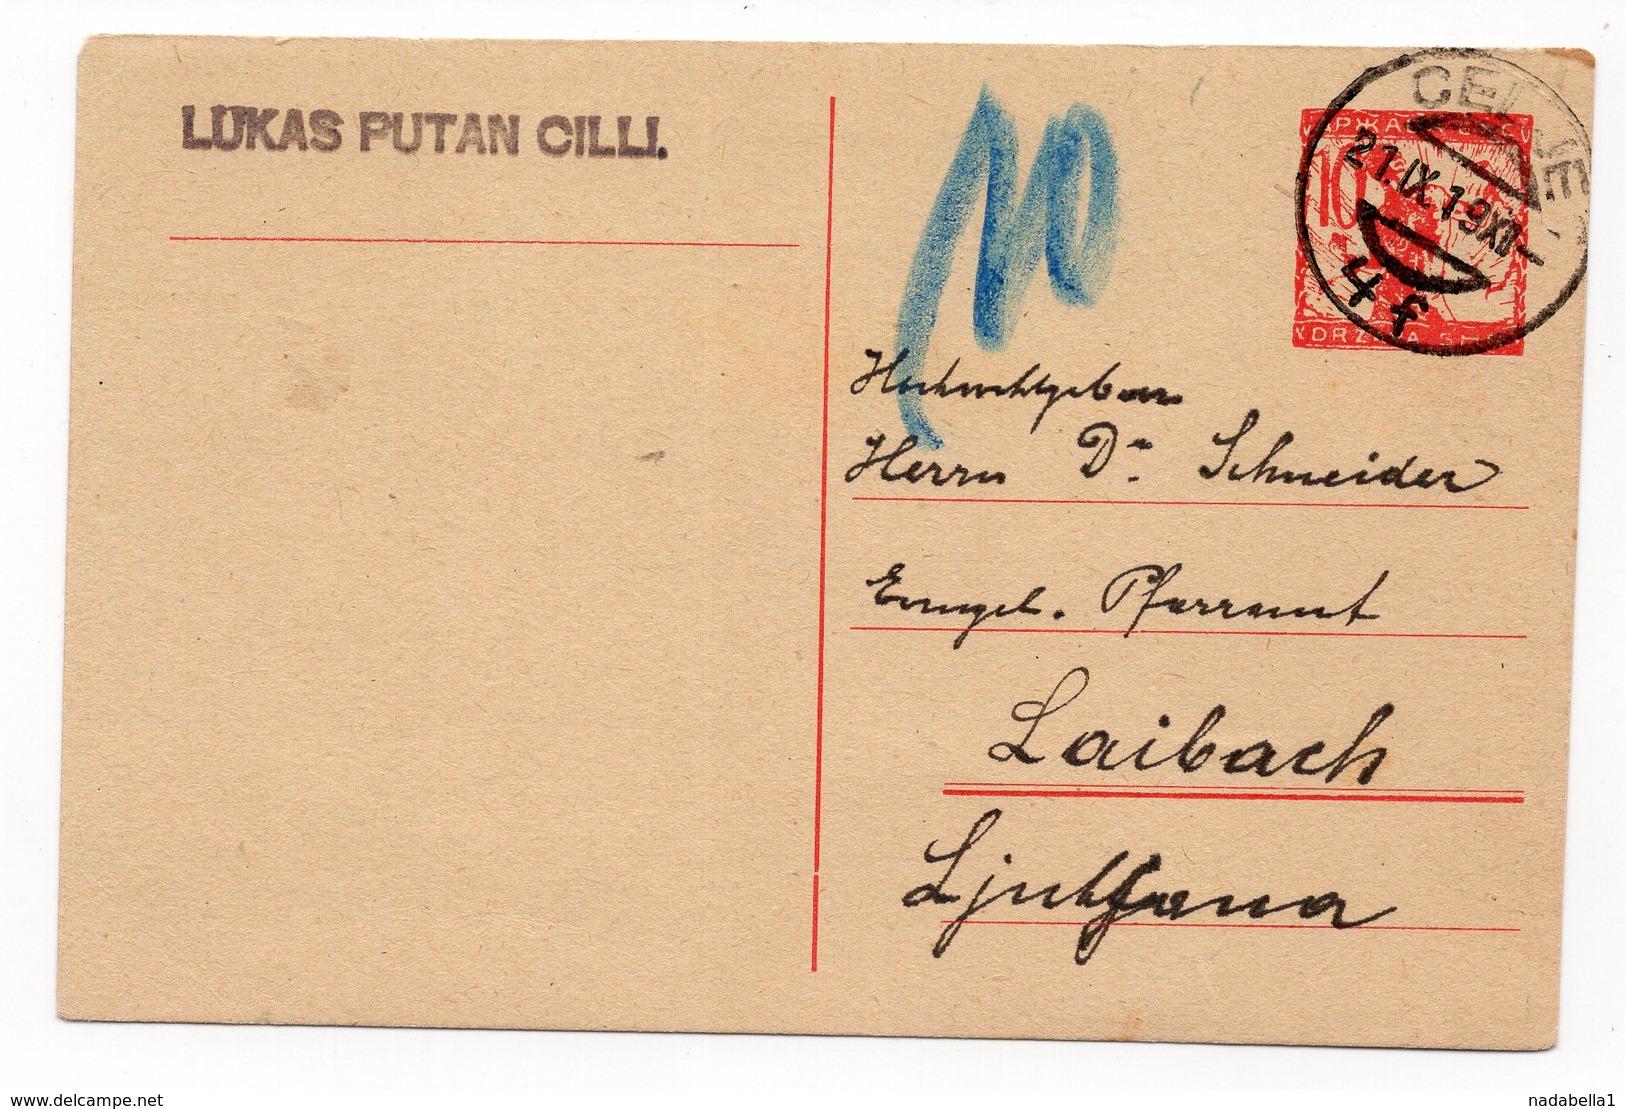 1919 KINGDOM OF SHS, SLOVENIA, CELJE TO LJUBLJANA, LAIBAH, POSTAL STATIONERY, USED - Postal Stationery